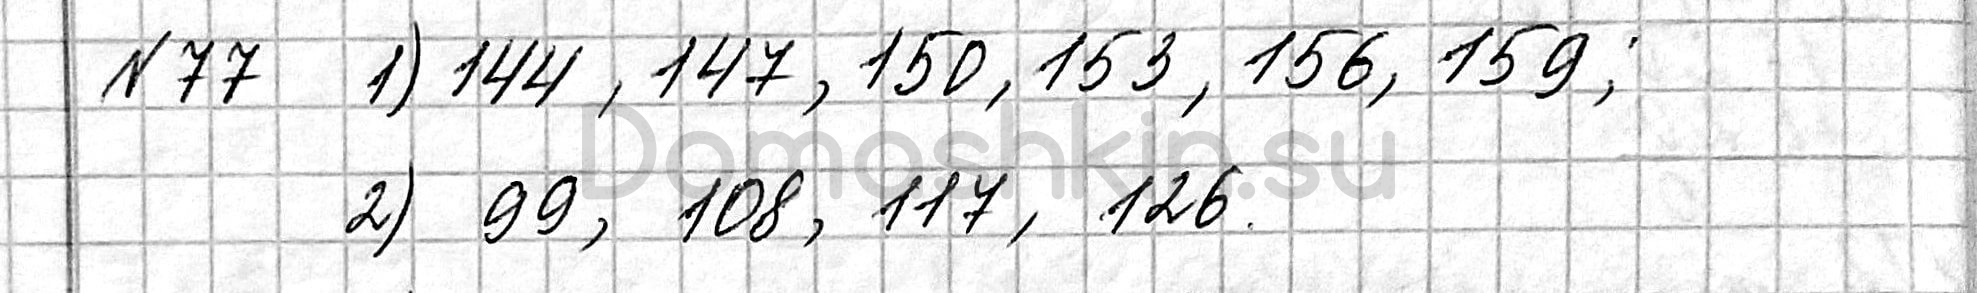 Математика 6 класс учебник Мерзляк номер 77 решение